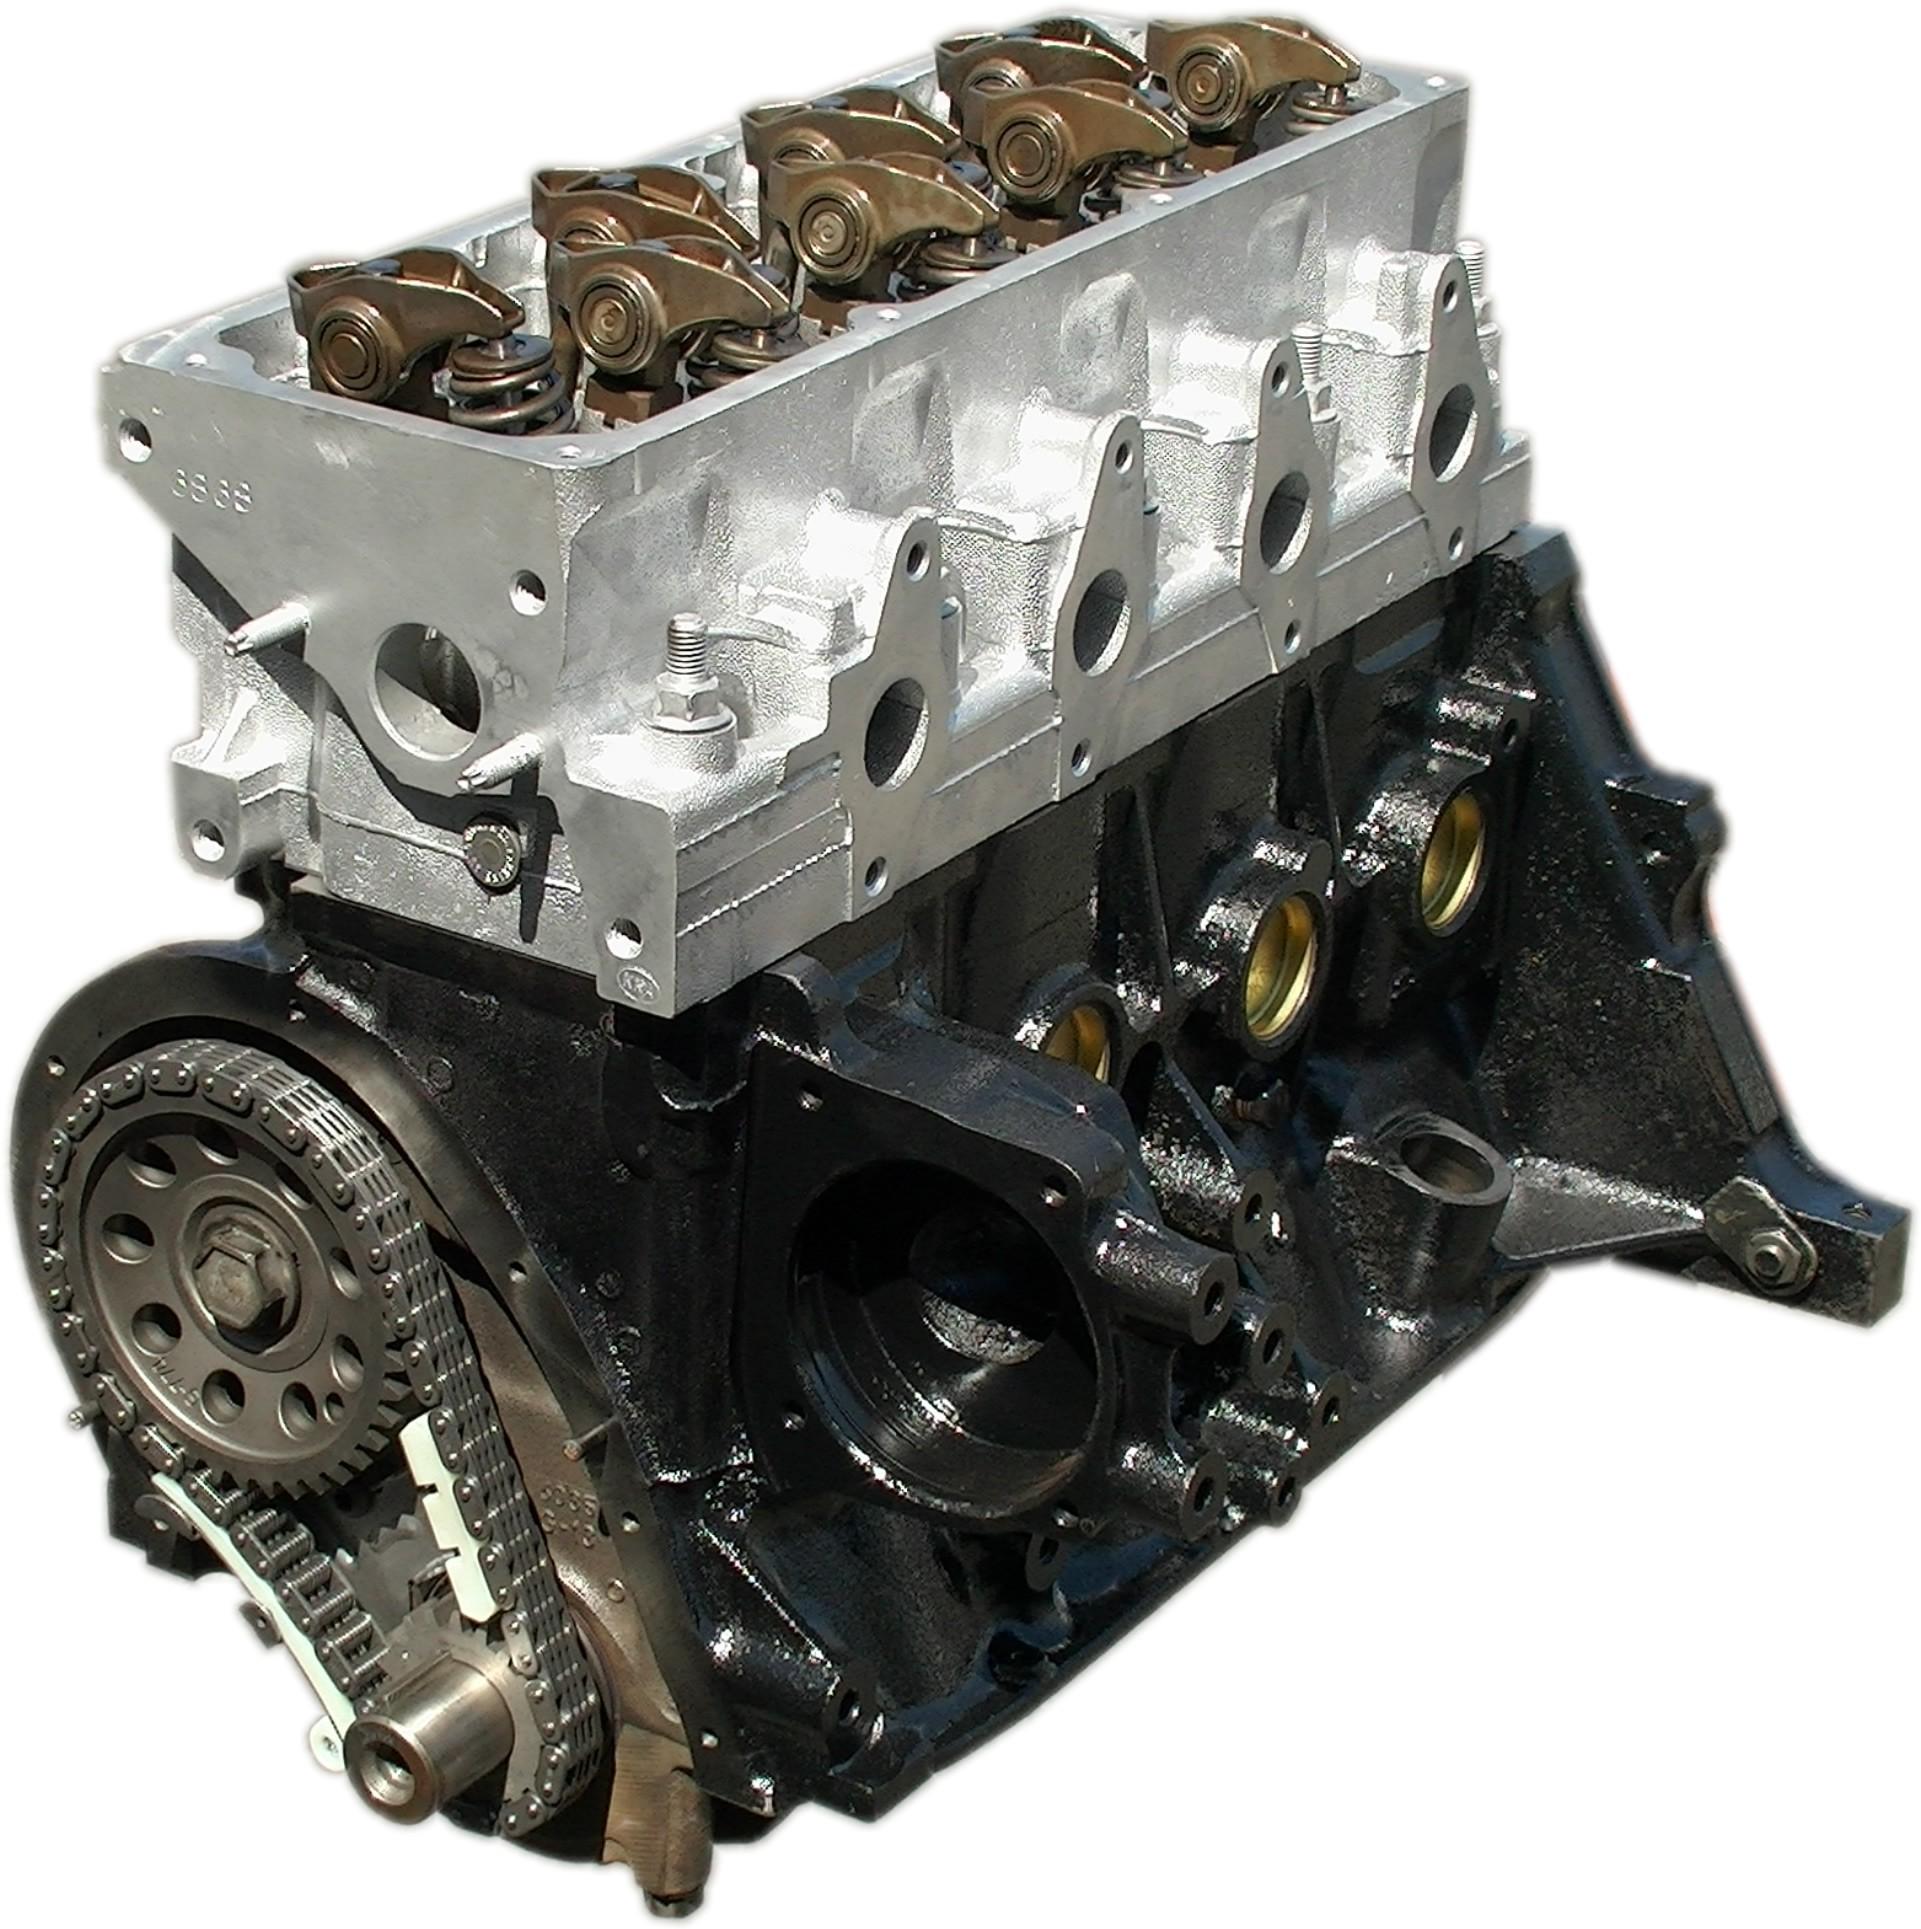 rebuilt 94 97 pontiac sunfire 2 2l 4cyl engine laquo kar king auto chevy cavalier engine diagram